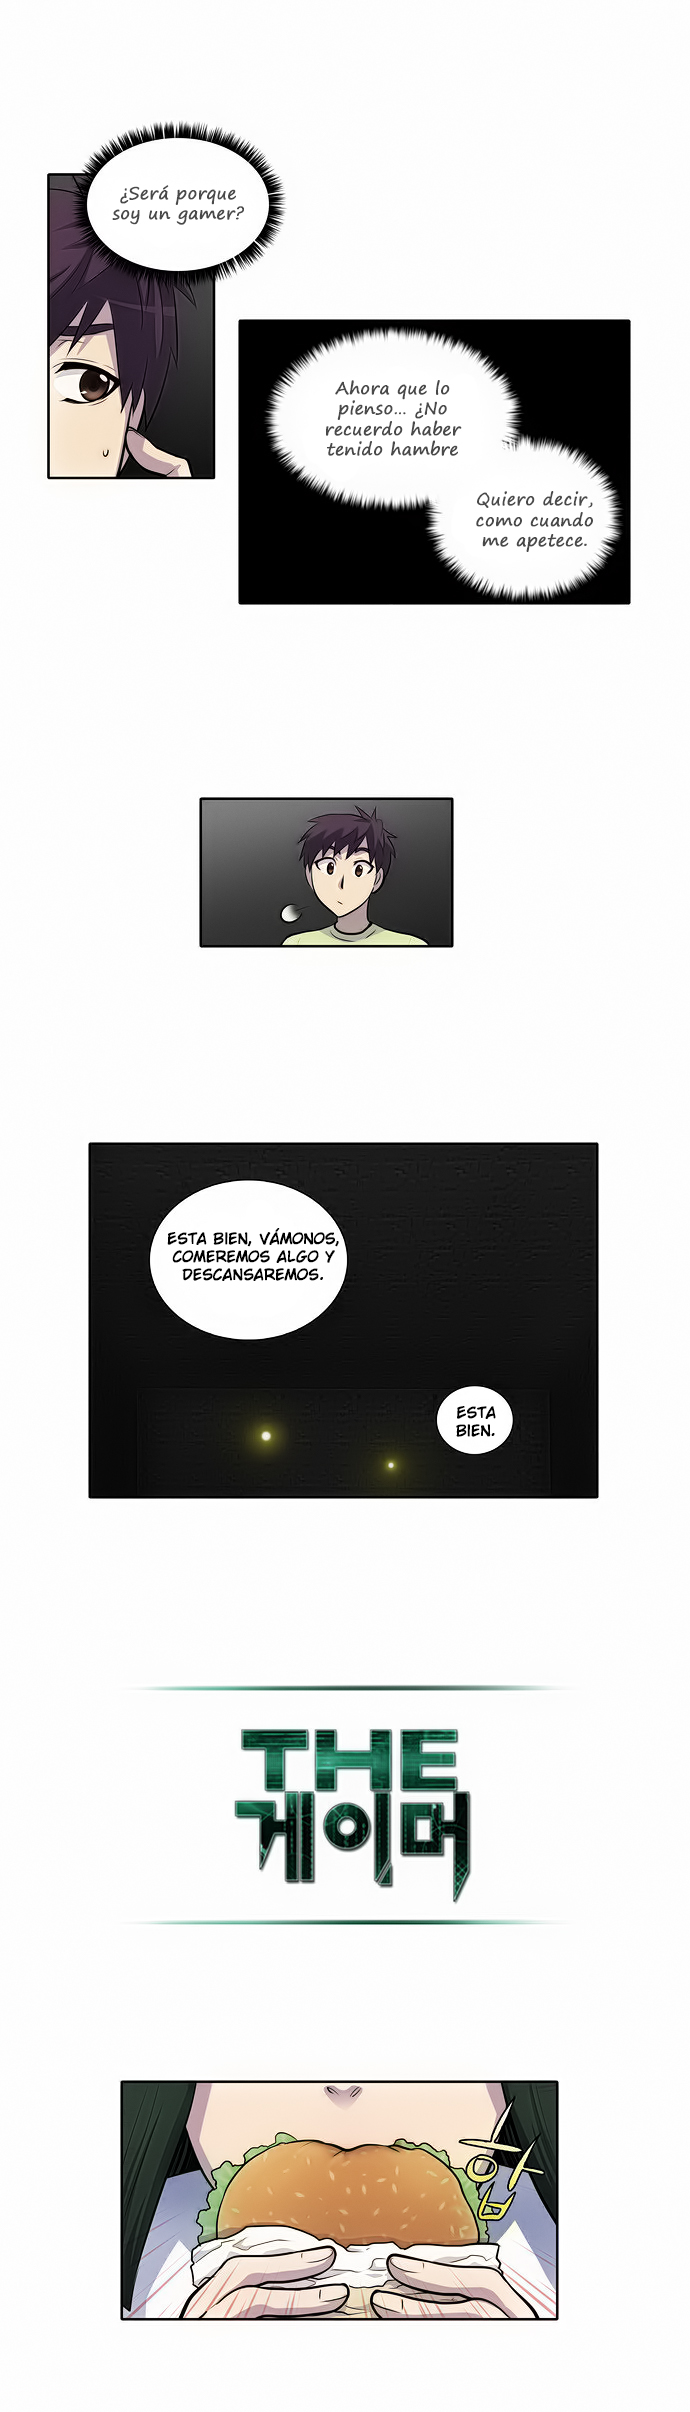 https://c5.ninemanga.com/es_manga/61/1725/434276/4ffd6130f73d7f56bbb4945039a91131.jpg Page 6